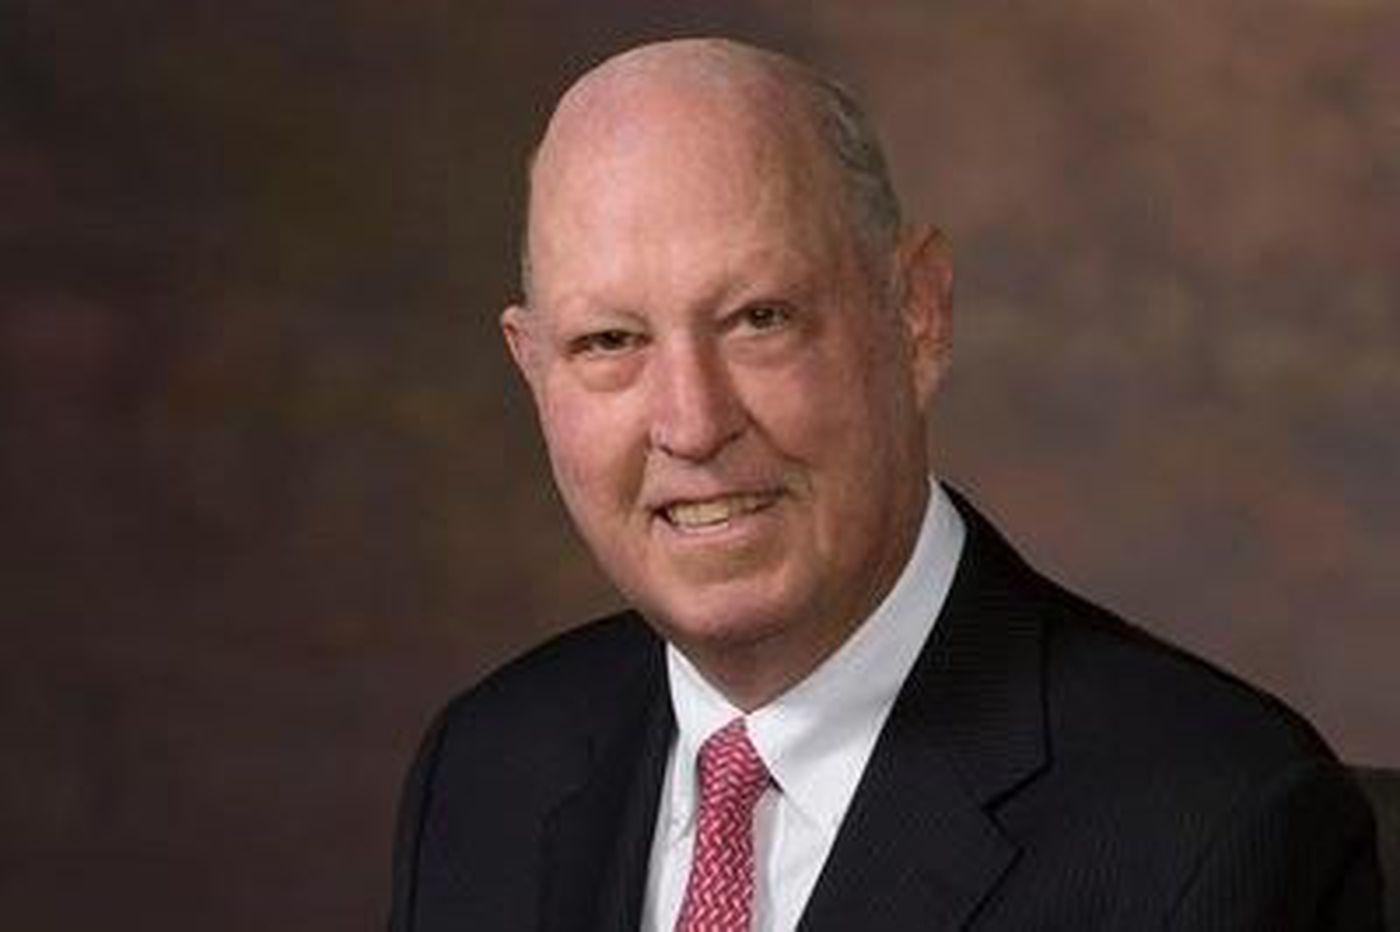 Joseph Anthony `Tony' Hayden, 74, real estate executive